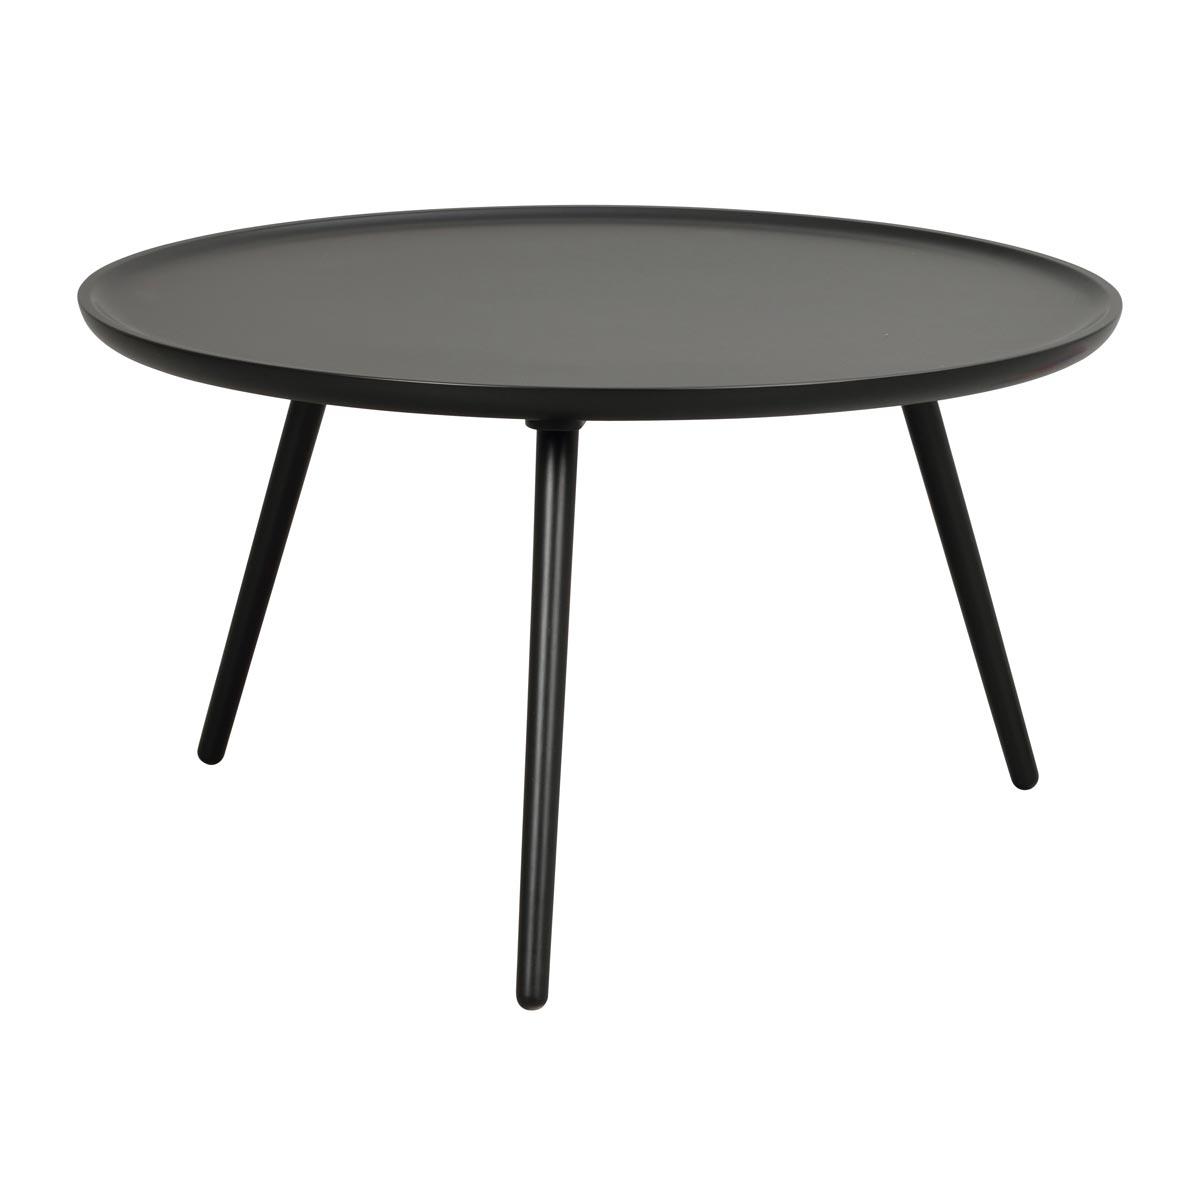 Daisy soffbord 80 svart R-111834